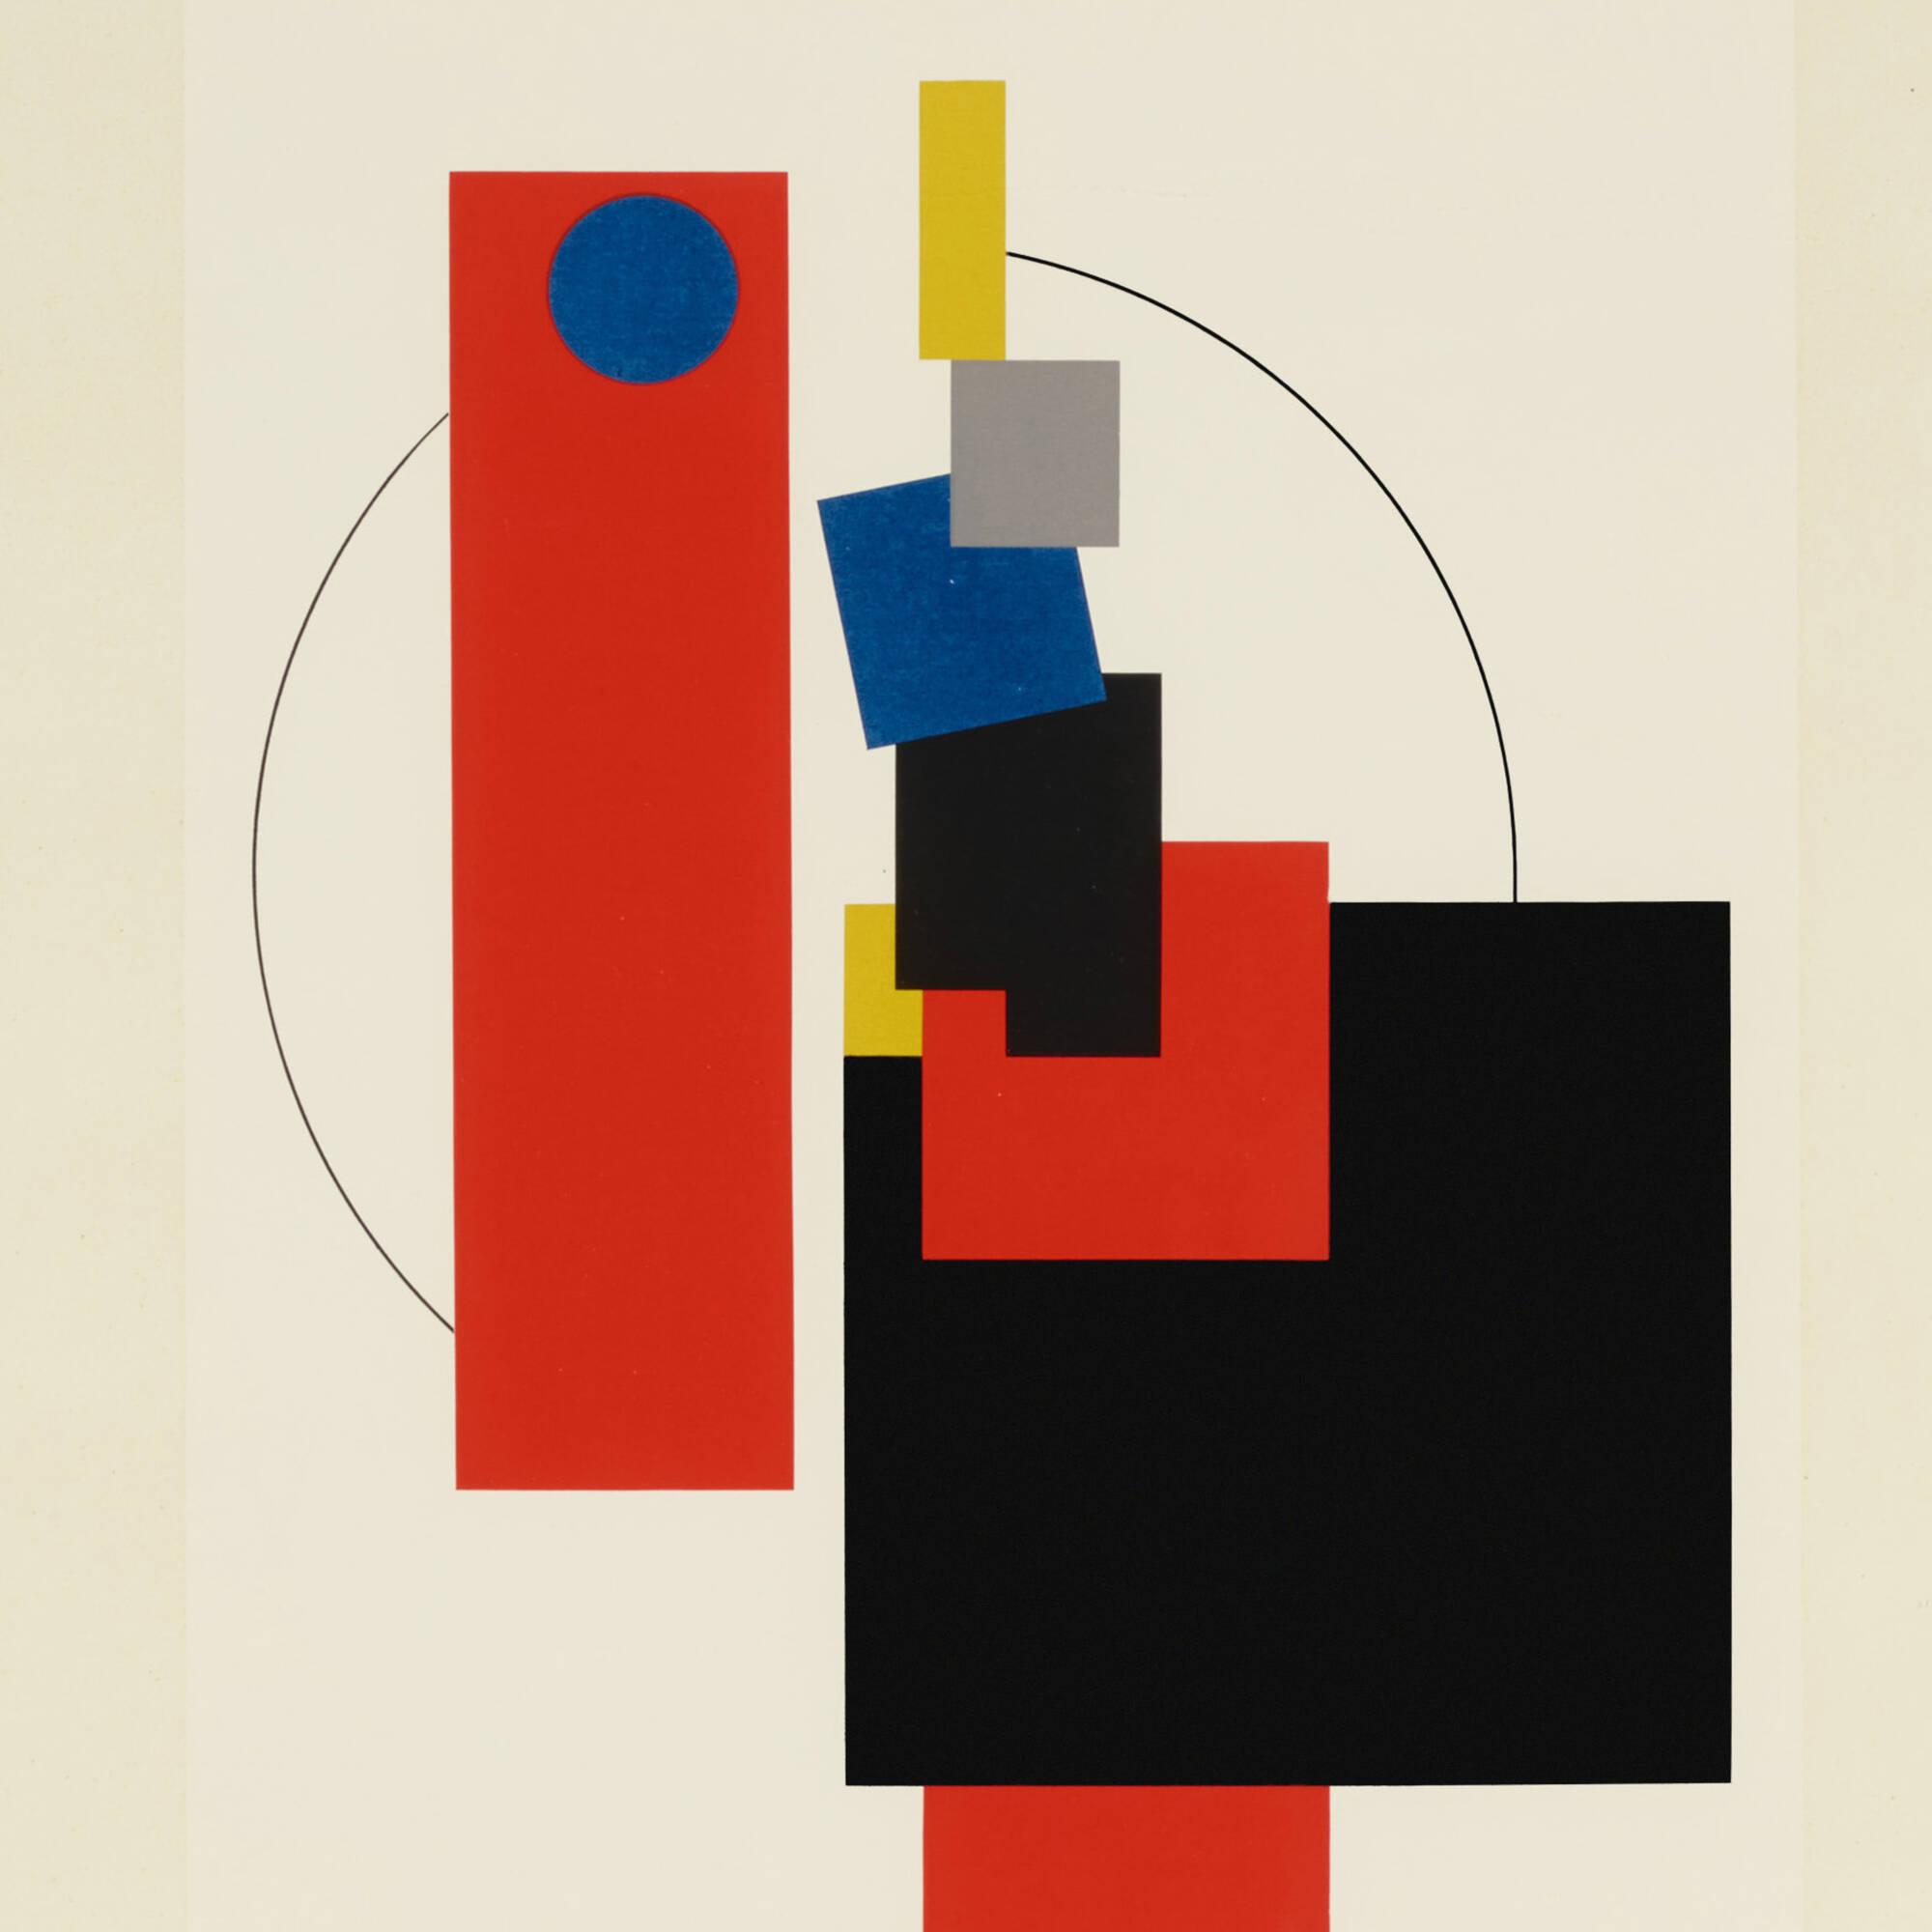 191: Lajos Kassak / Untitled (from the Bildarchitectur portfolio) (2 of 2)